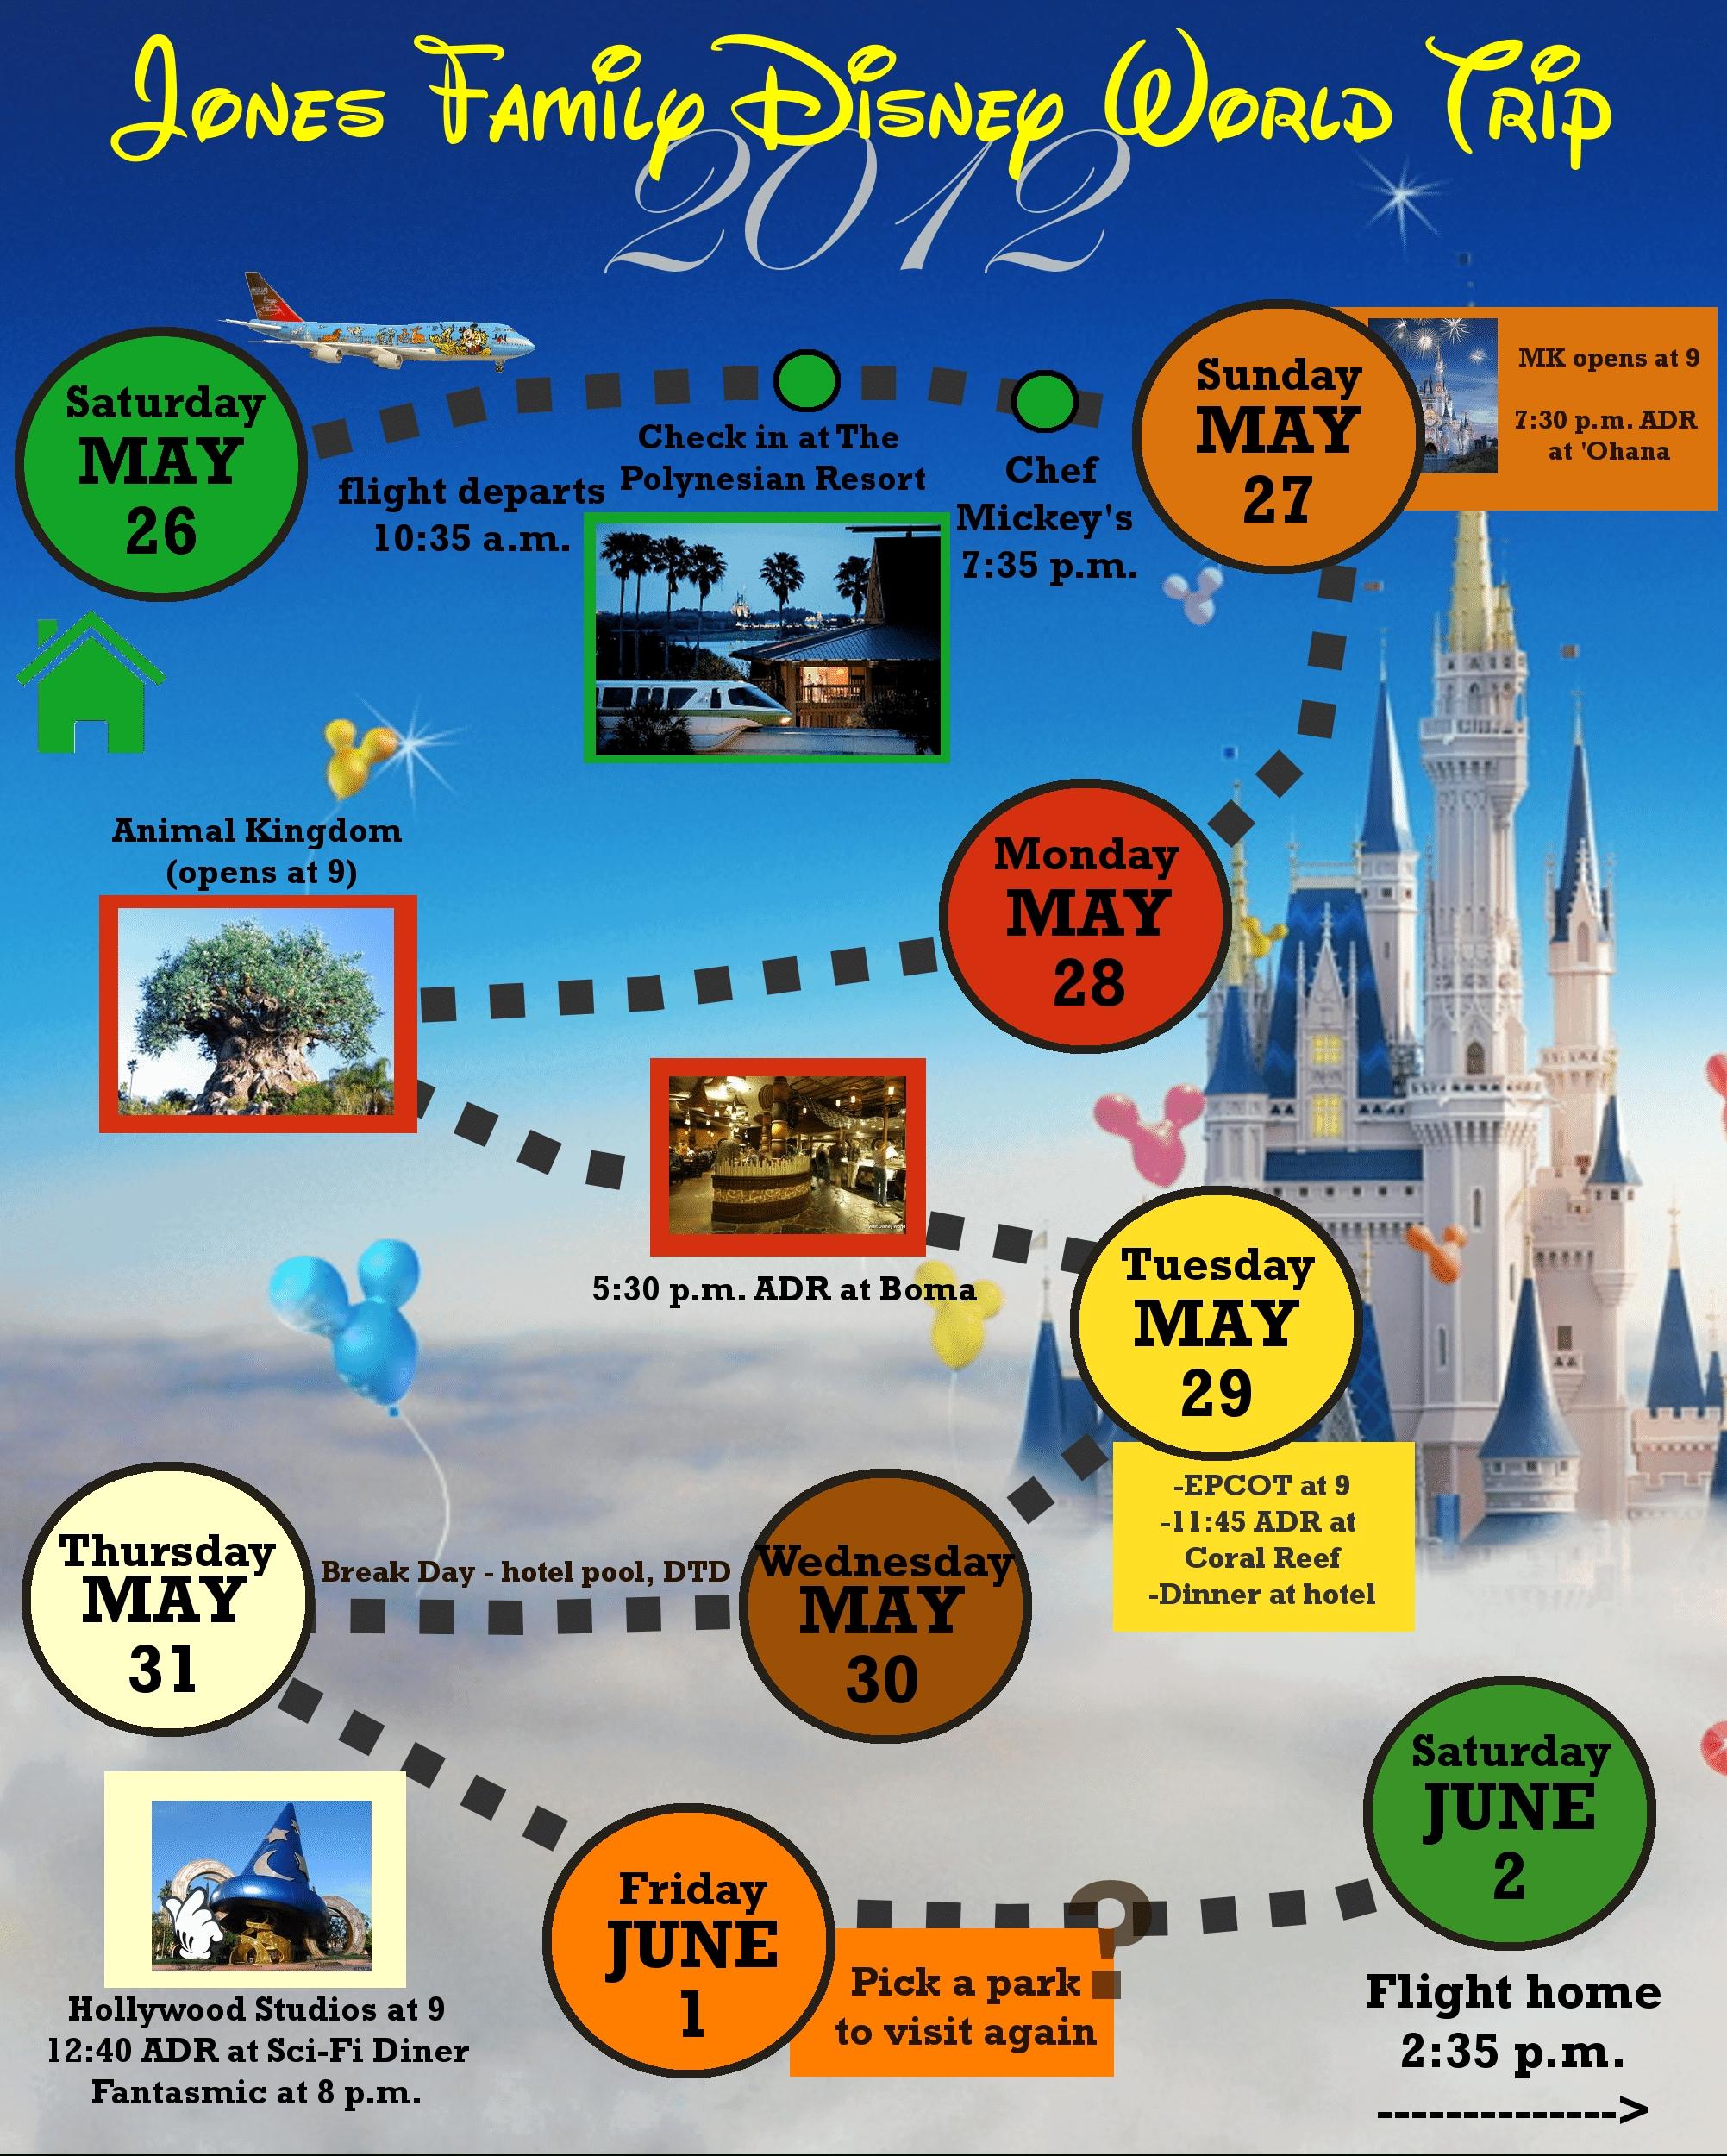 2 Custom Disney World Itinerary Templates | Wdw Prep School-Free Disney World Itinerary Template